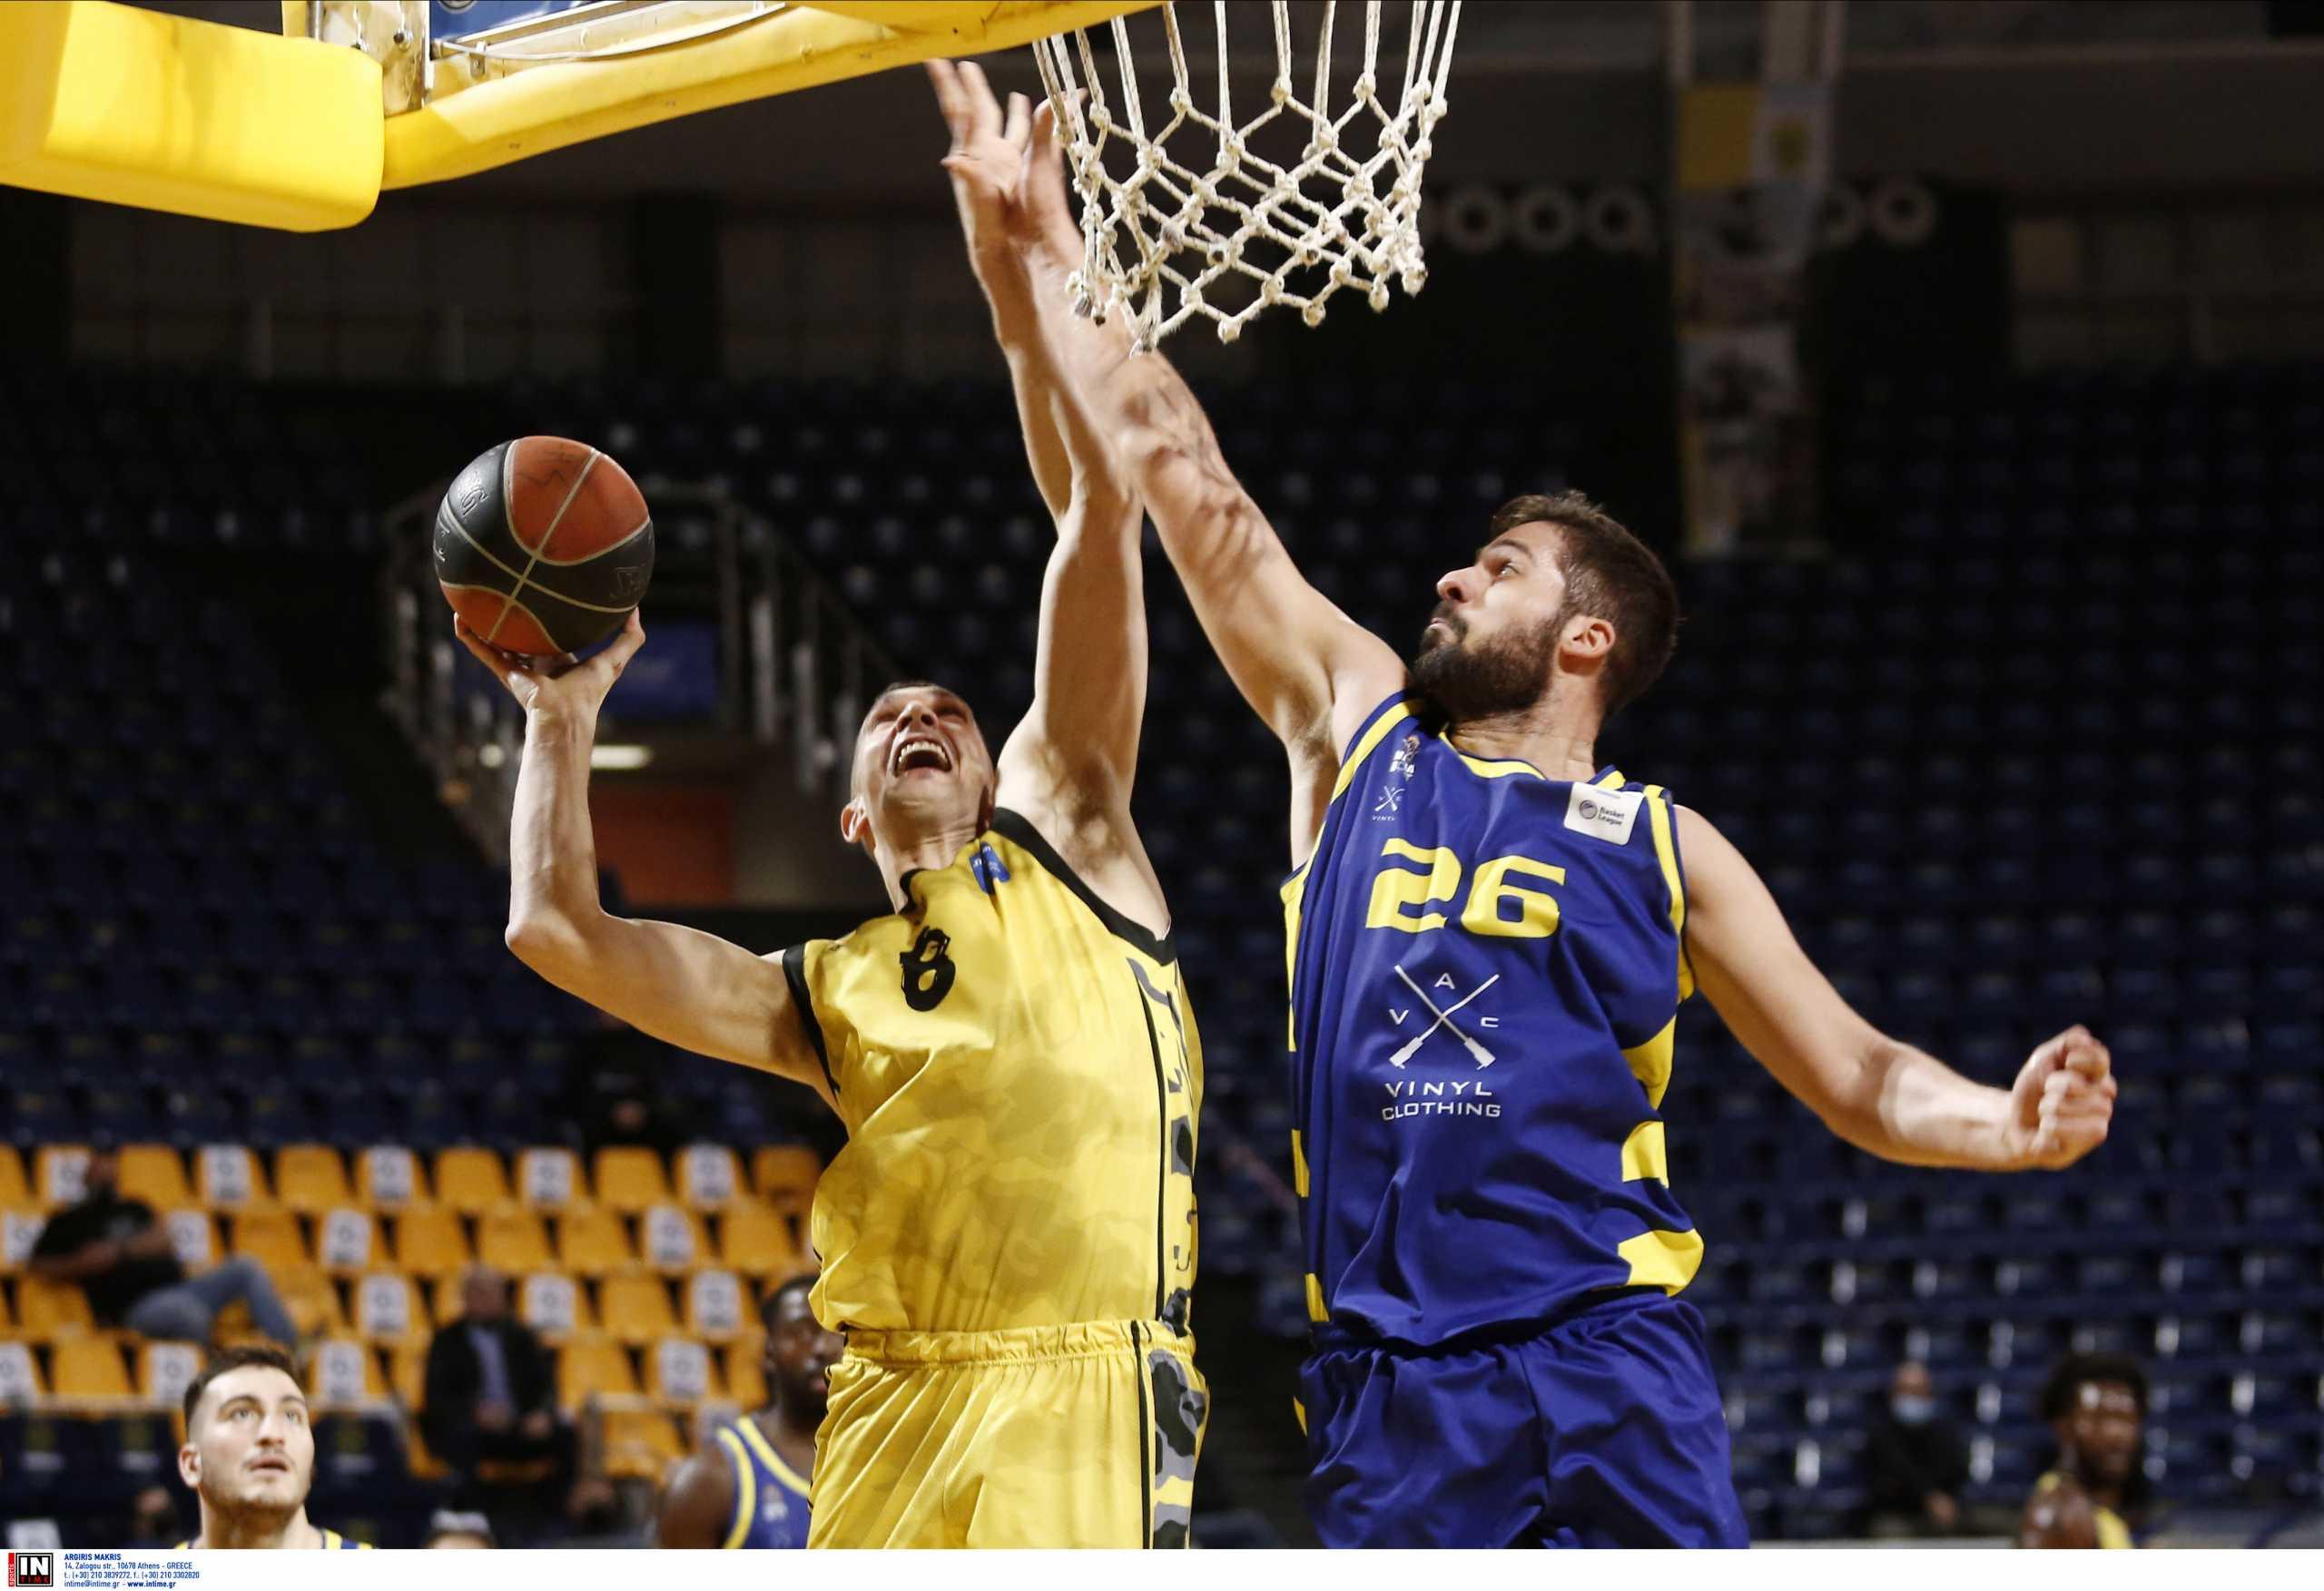 Basket League: Ένσταση ο Άρης, νίκες για Λαύριο και Προμηθέα (video)